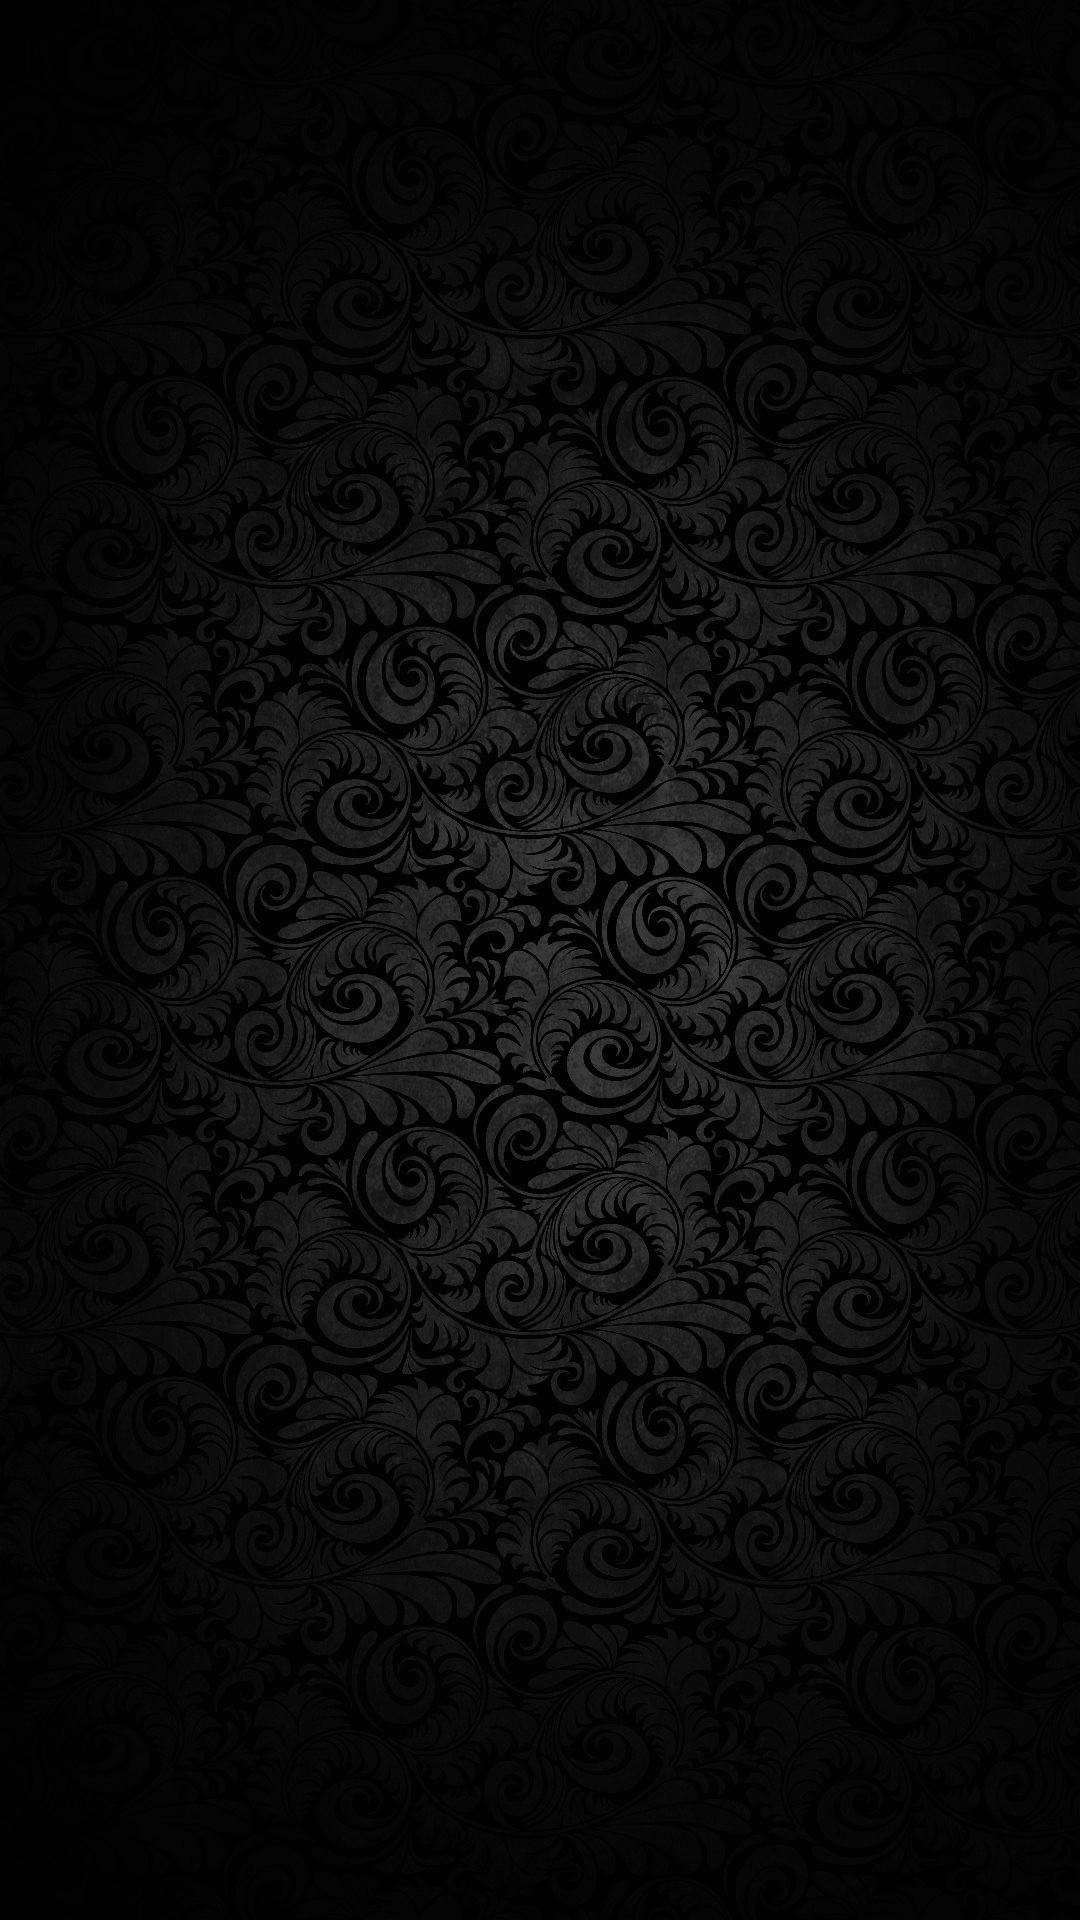 oft Full HD Smartphone Wallpapers (85+ images) JM86